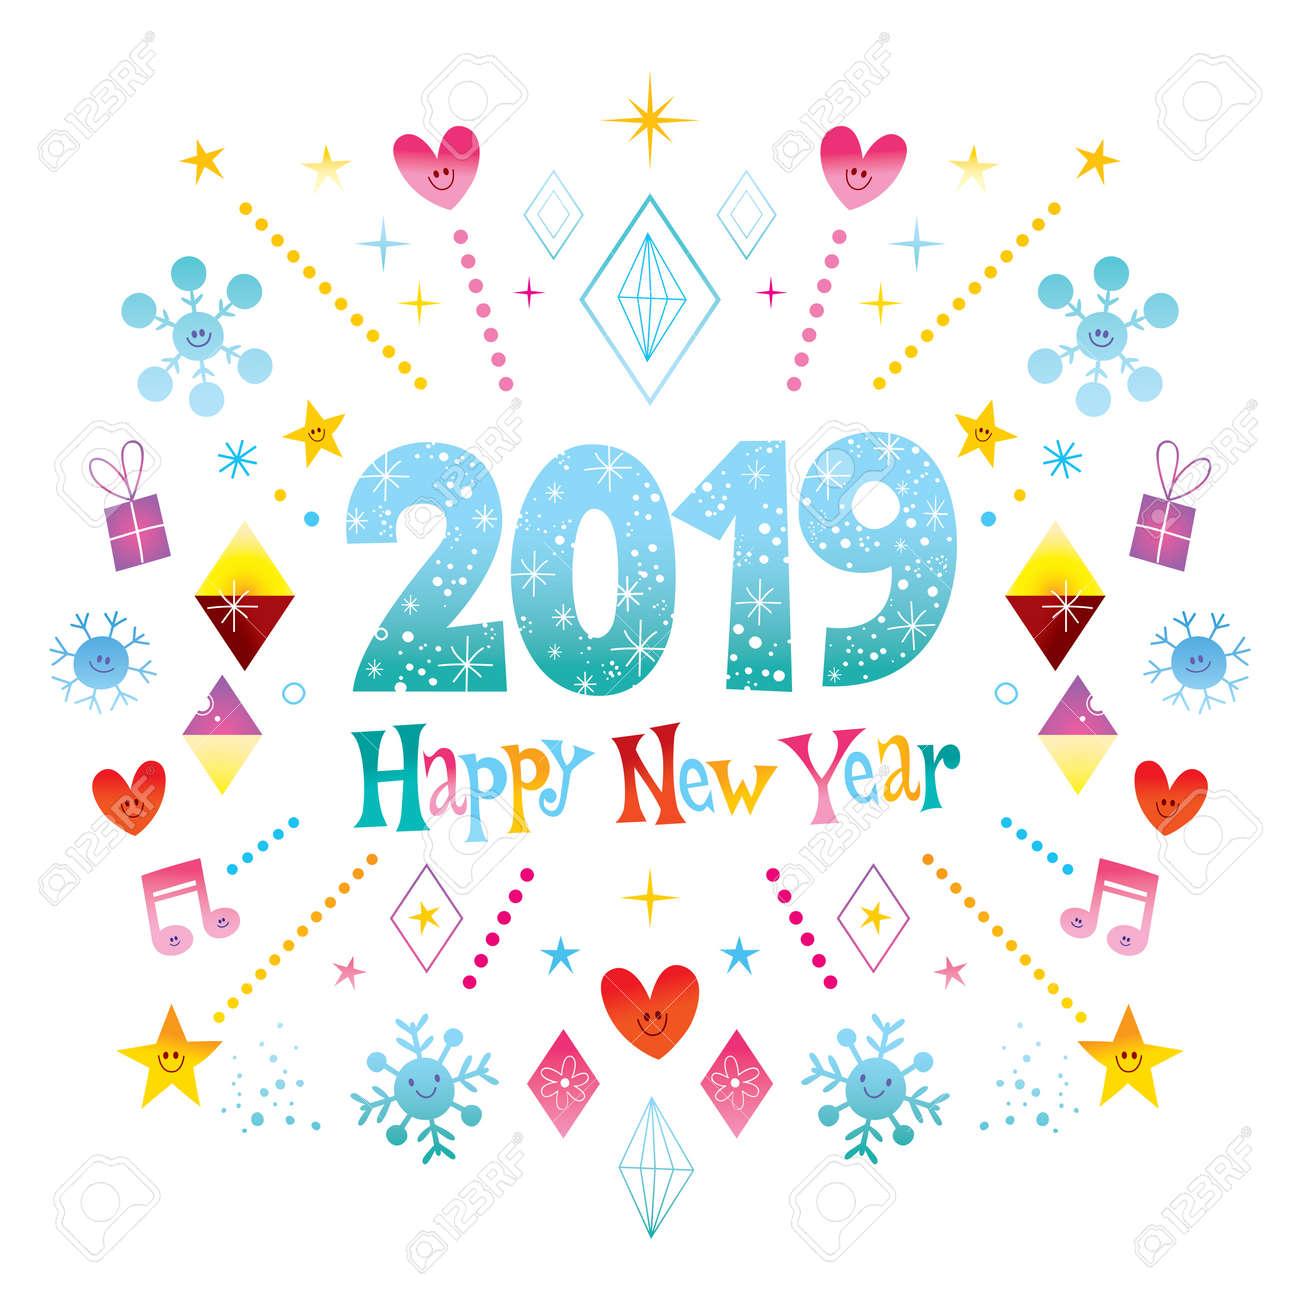 Happy New Year 2019 Greeting Card Royalty Free Cliparts Vectors